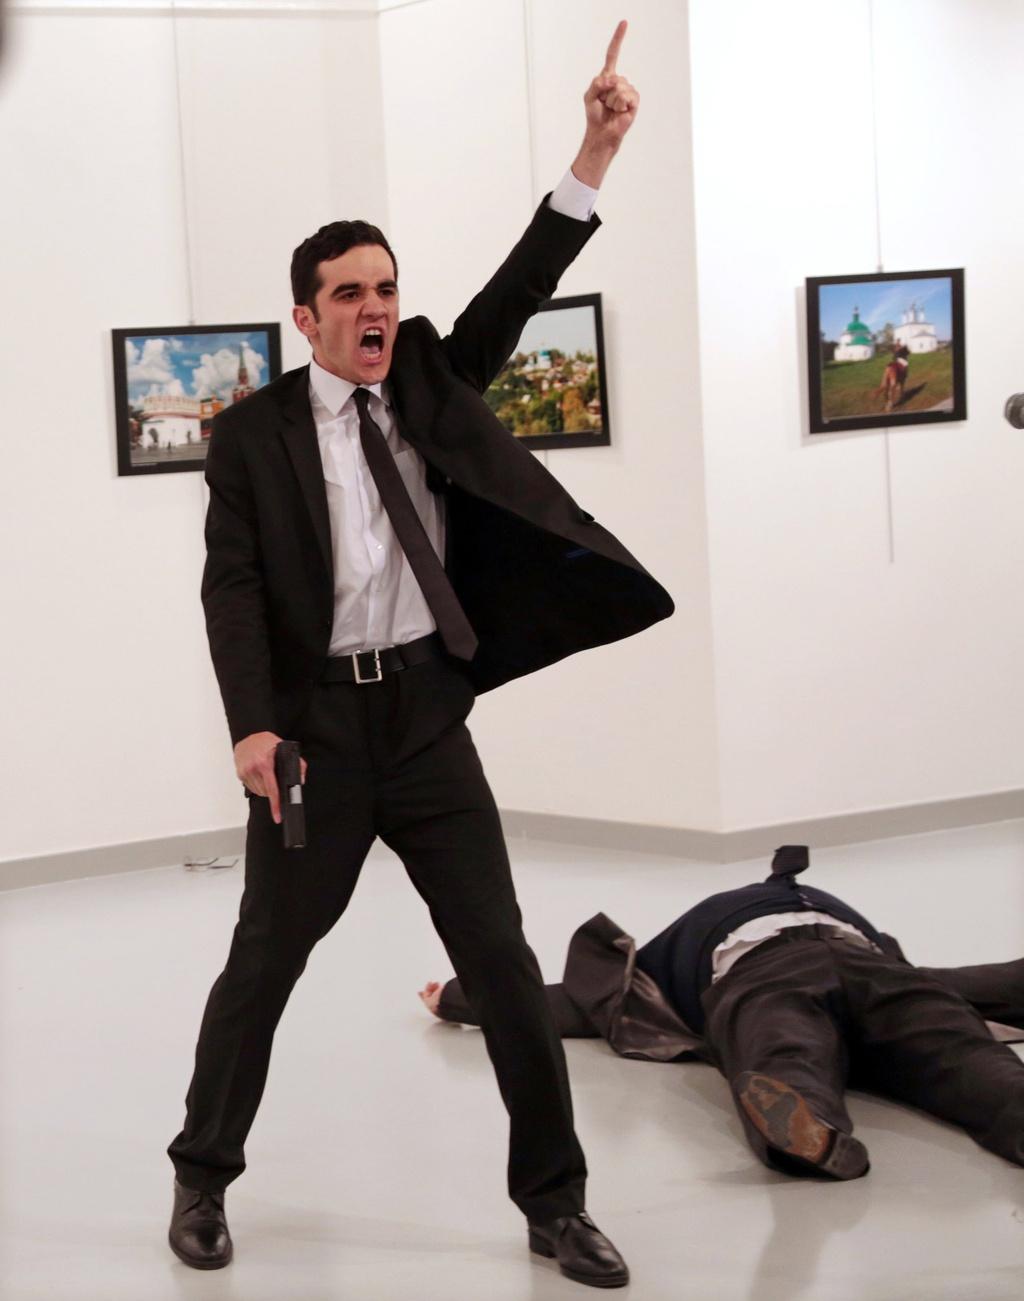 Anh dai su Nga bi am sat doat giai World Press Photo 2017 hinh anh 1